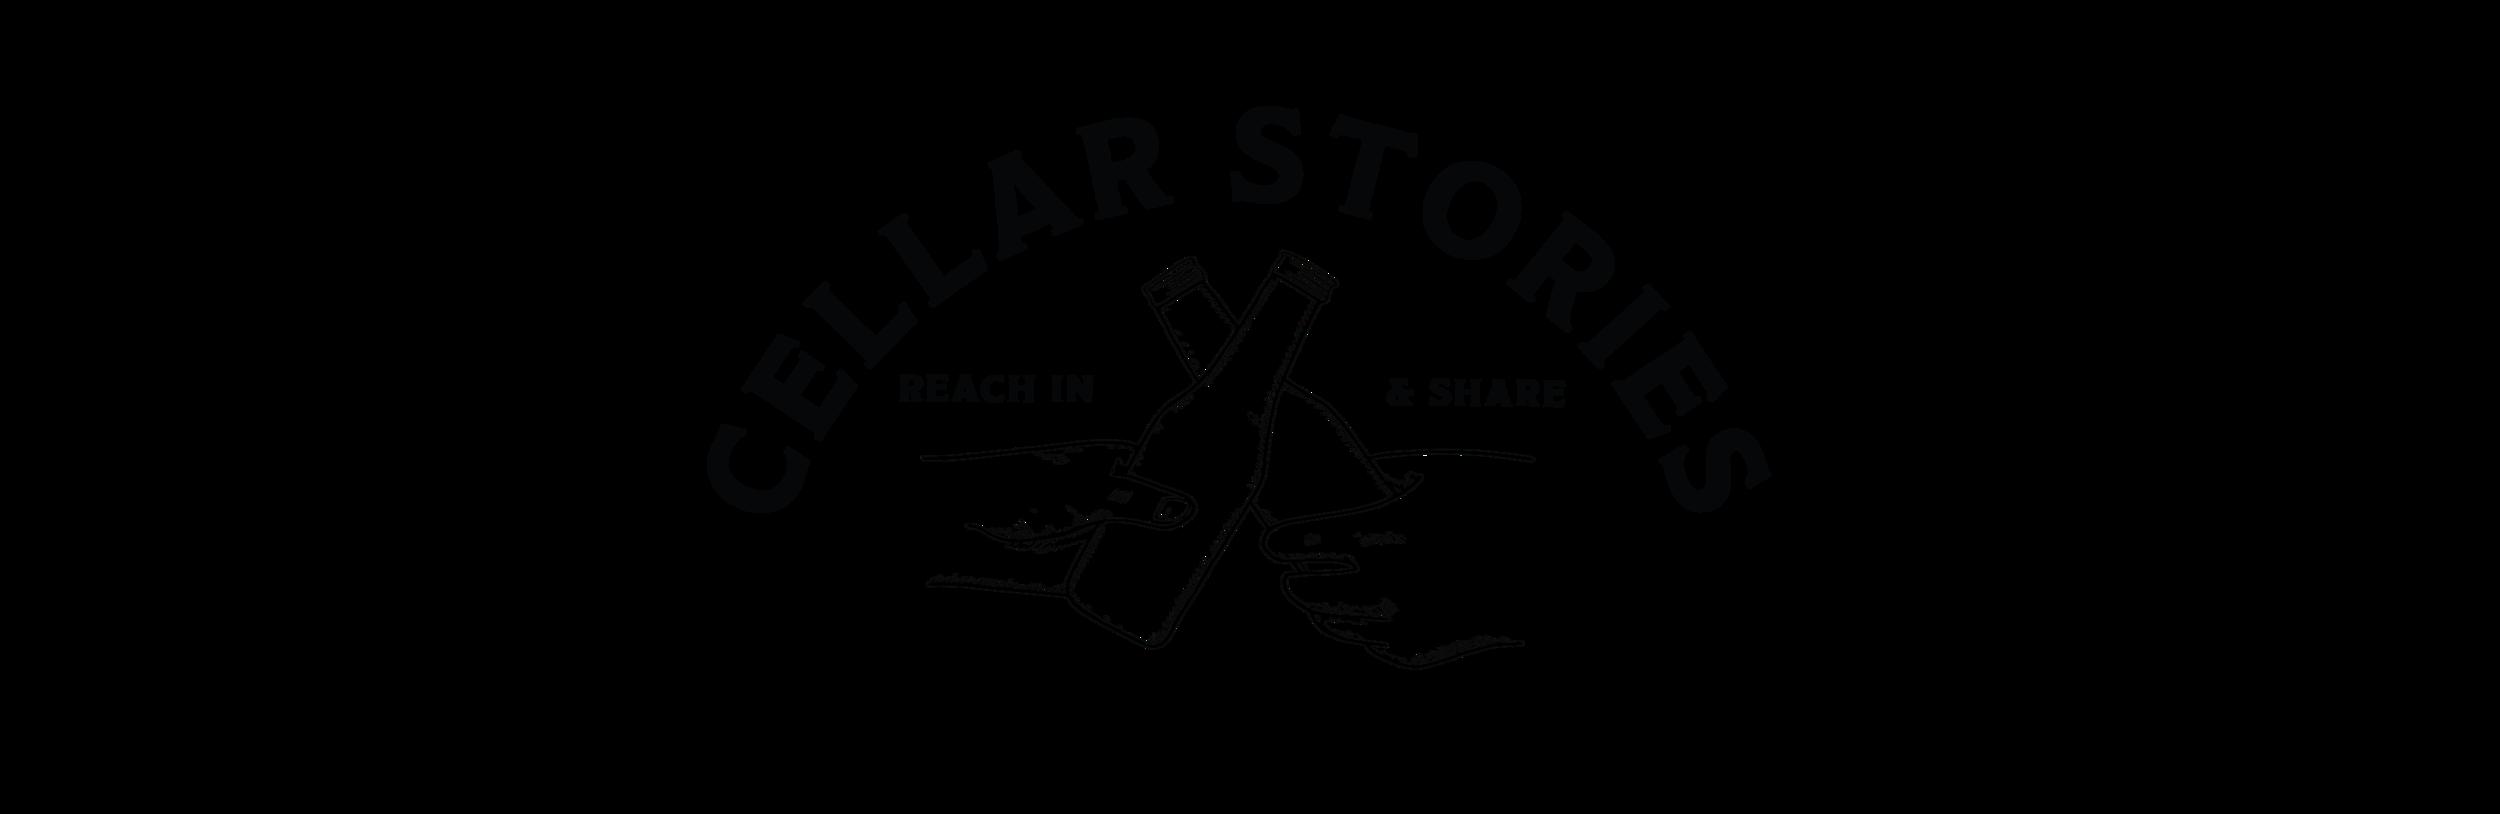 CellarStories-01.png